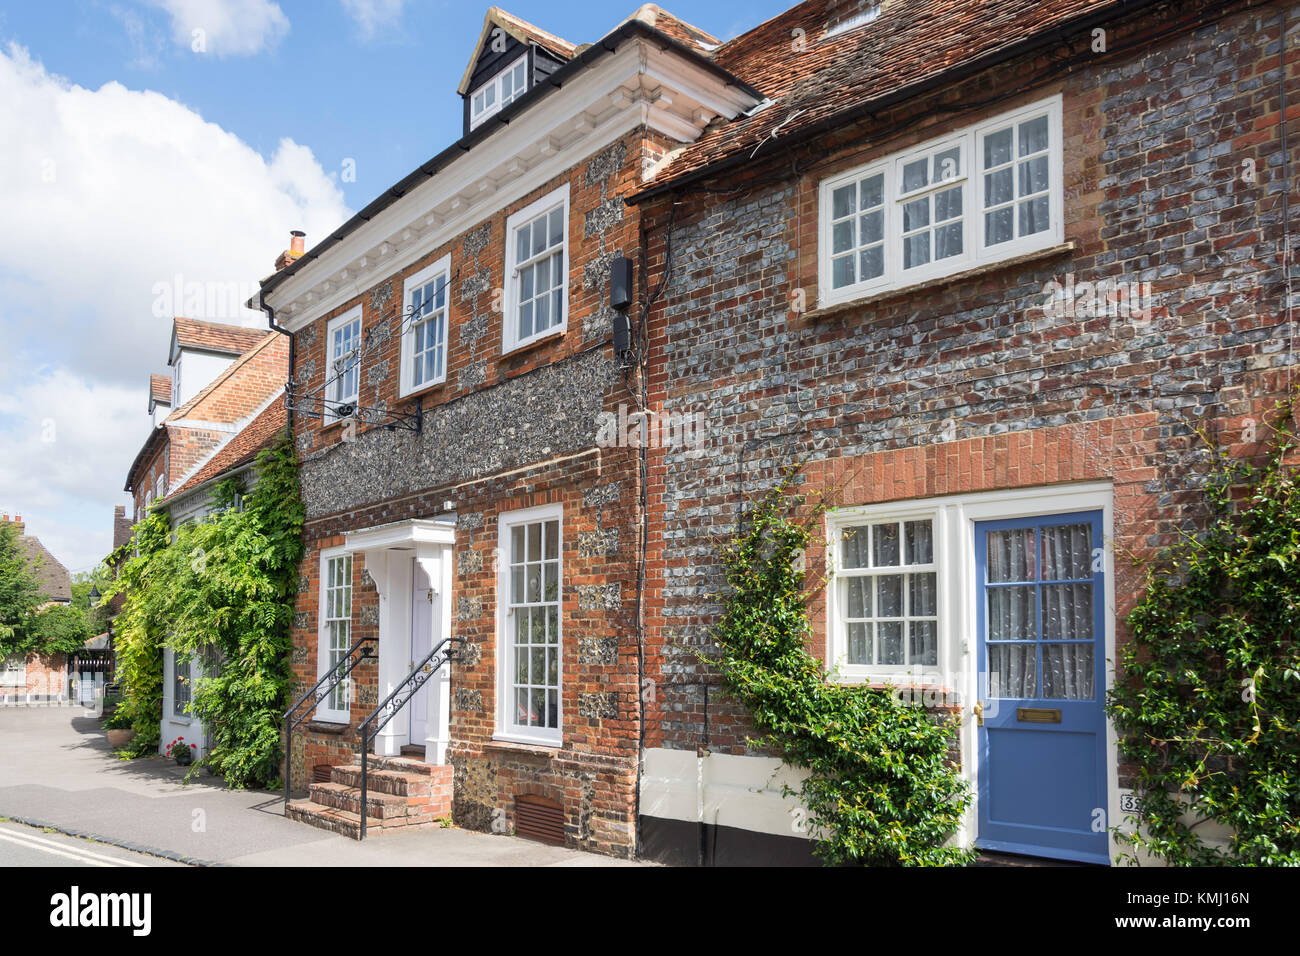 Period houses, High Street, Watlington, Oxfordshire, England, United Kingdom - Stock Image